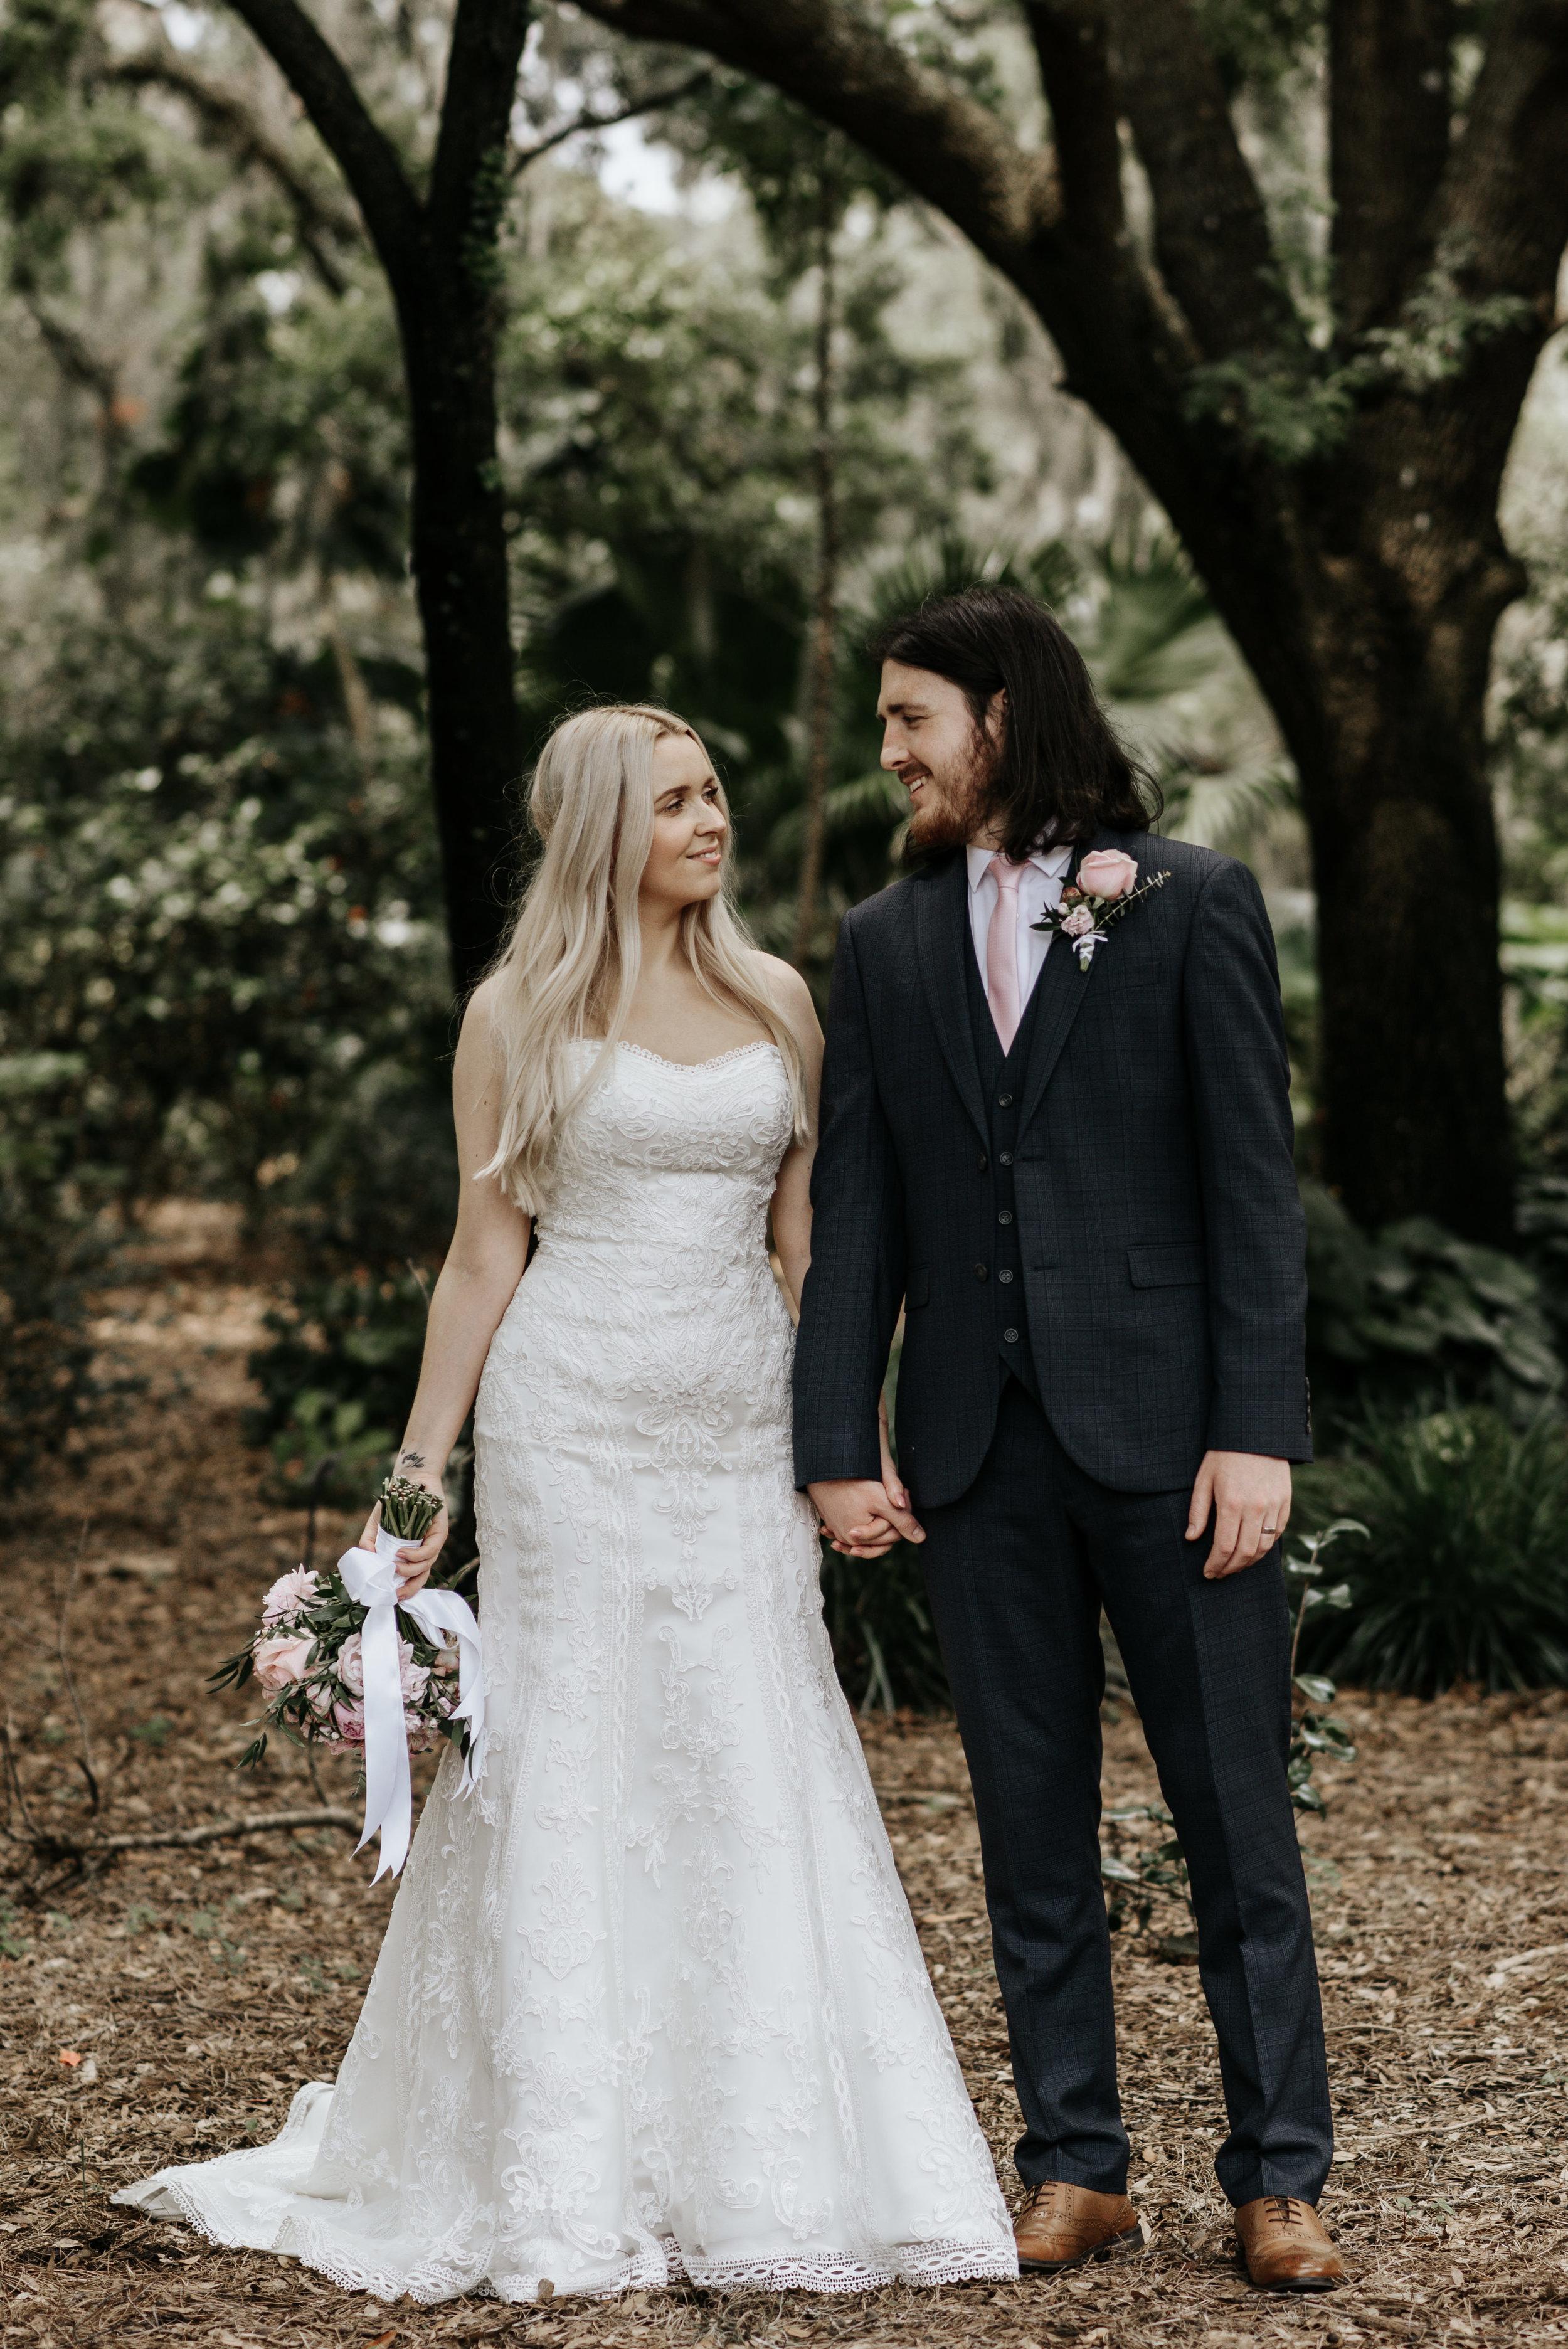 Lora-Richard-Wedding-1347.jpg